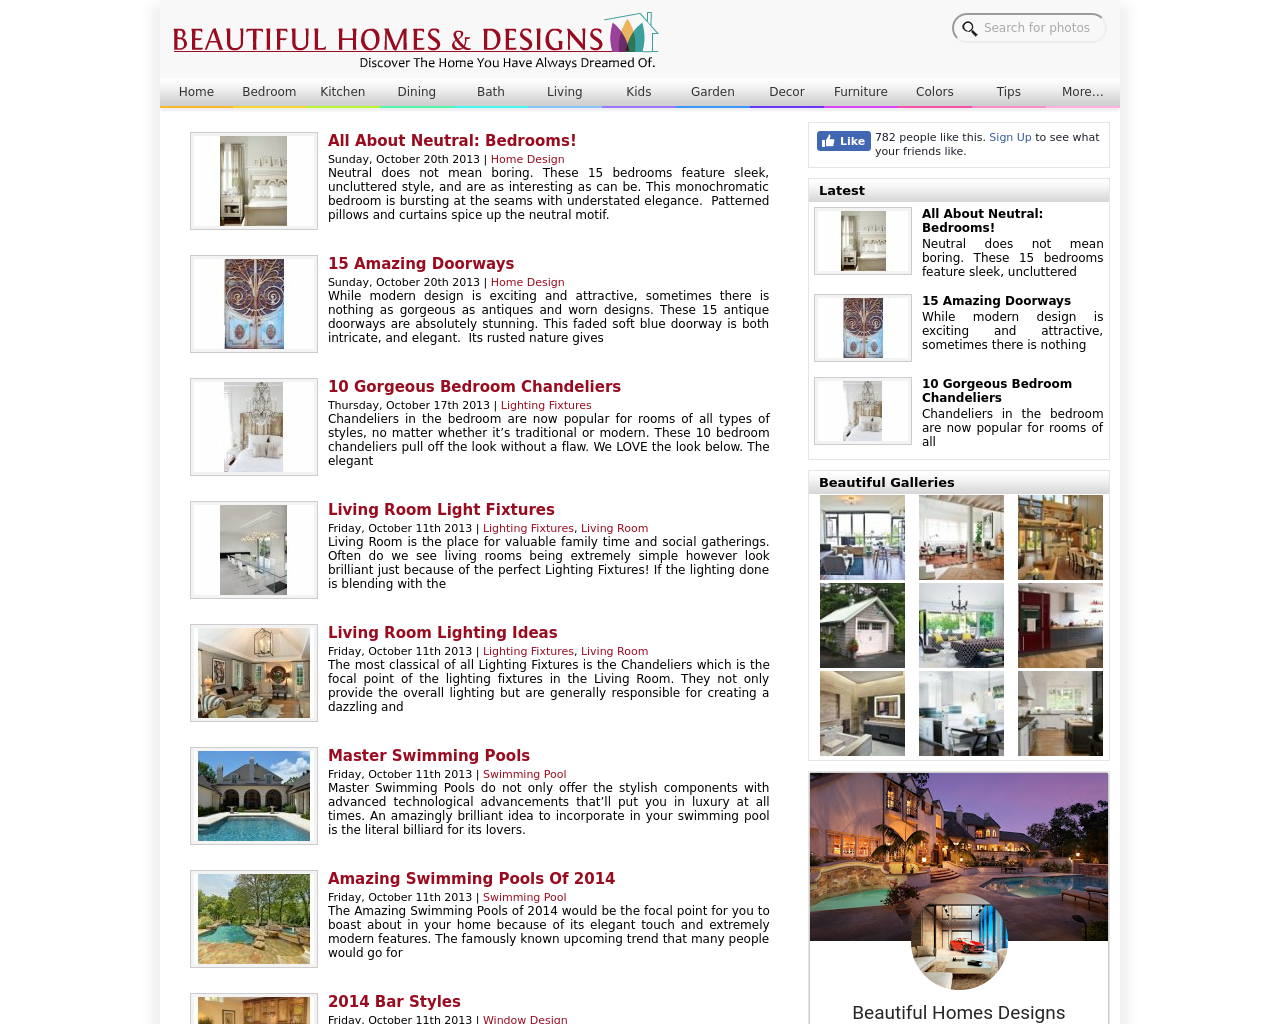 Beautiful-Homes-&-Designs-Advertising-Reviews-Pricing